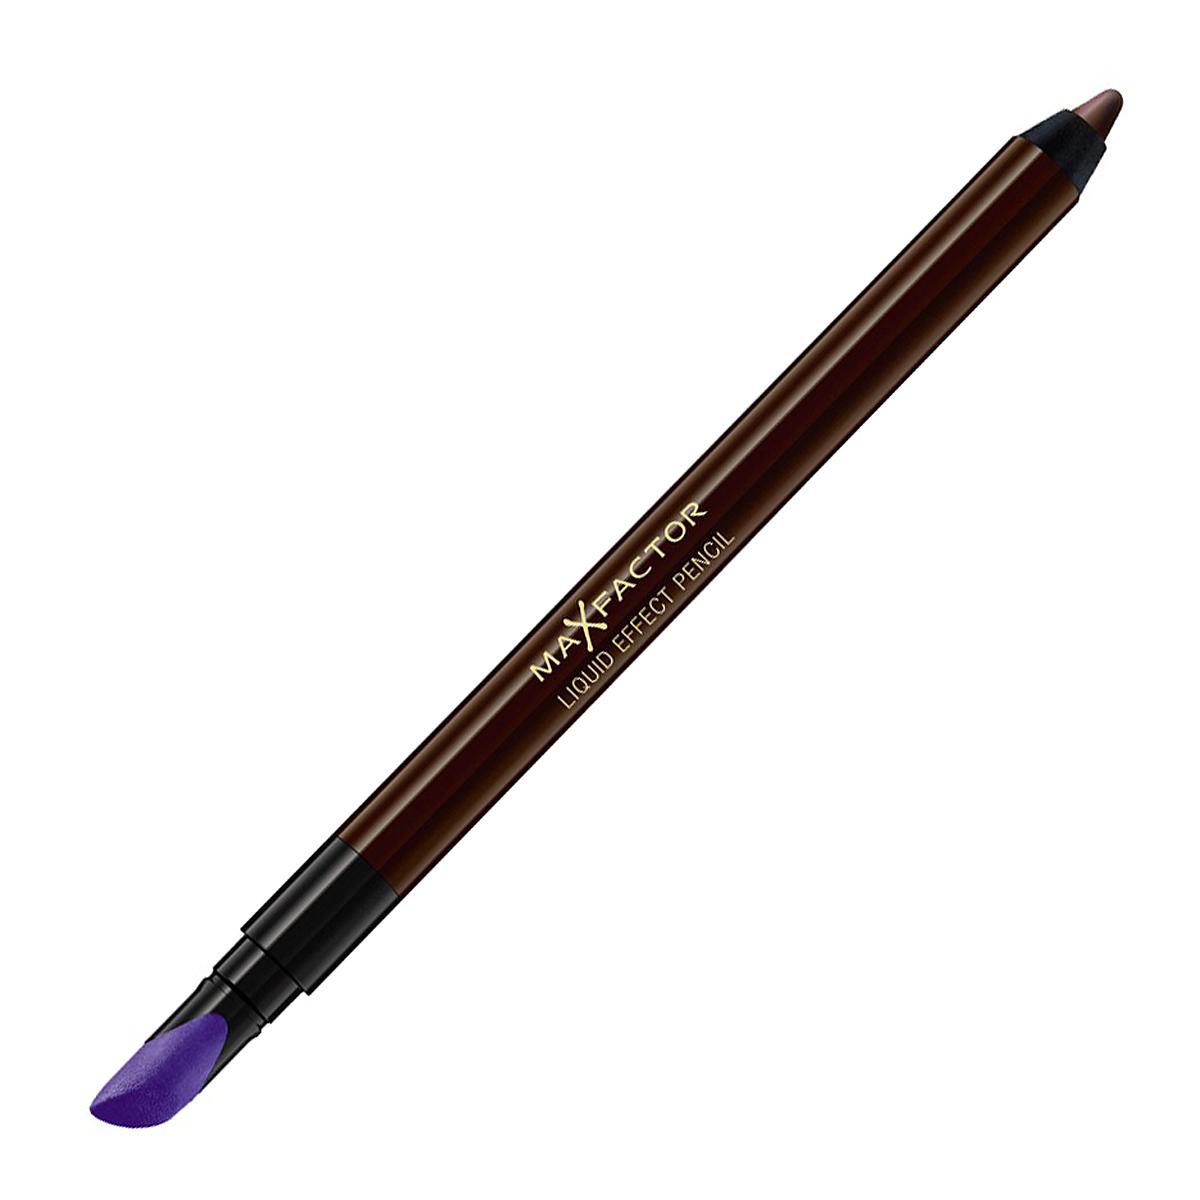 Max Factor Карандаш для глаз Liquid Effect Pencil, тон №05 Brown blaze, цвет: коричневый max factor карандаш для глаз liquid effect pencil тон 05 brown blaze цвет коричневый